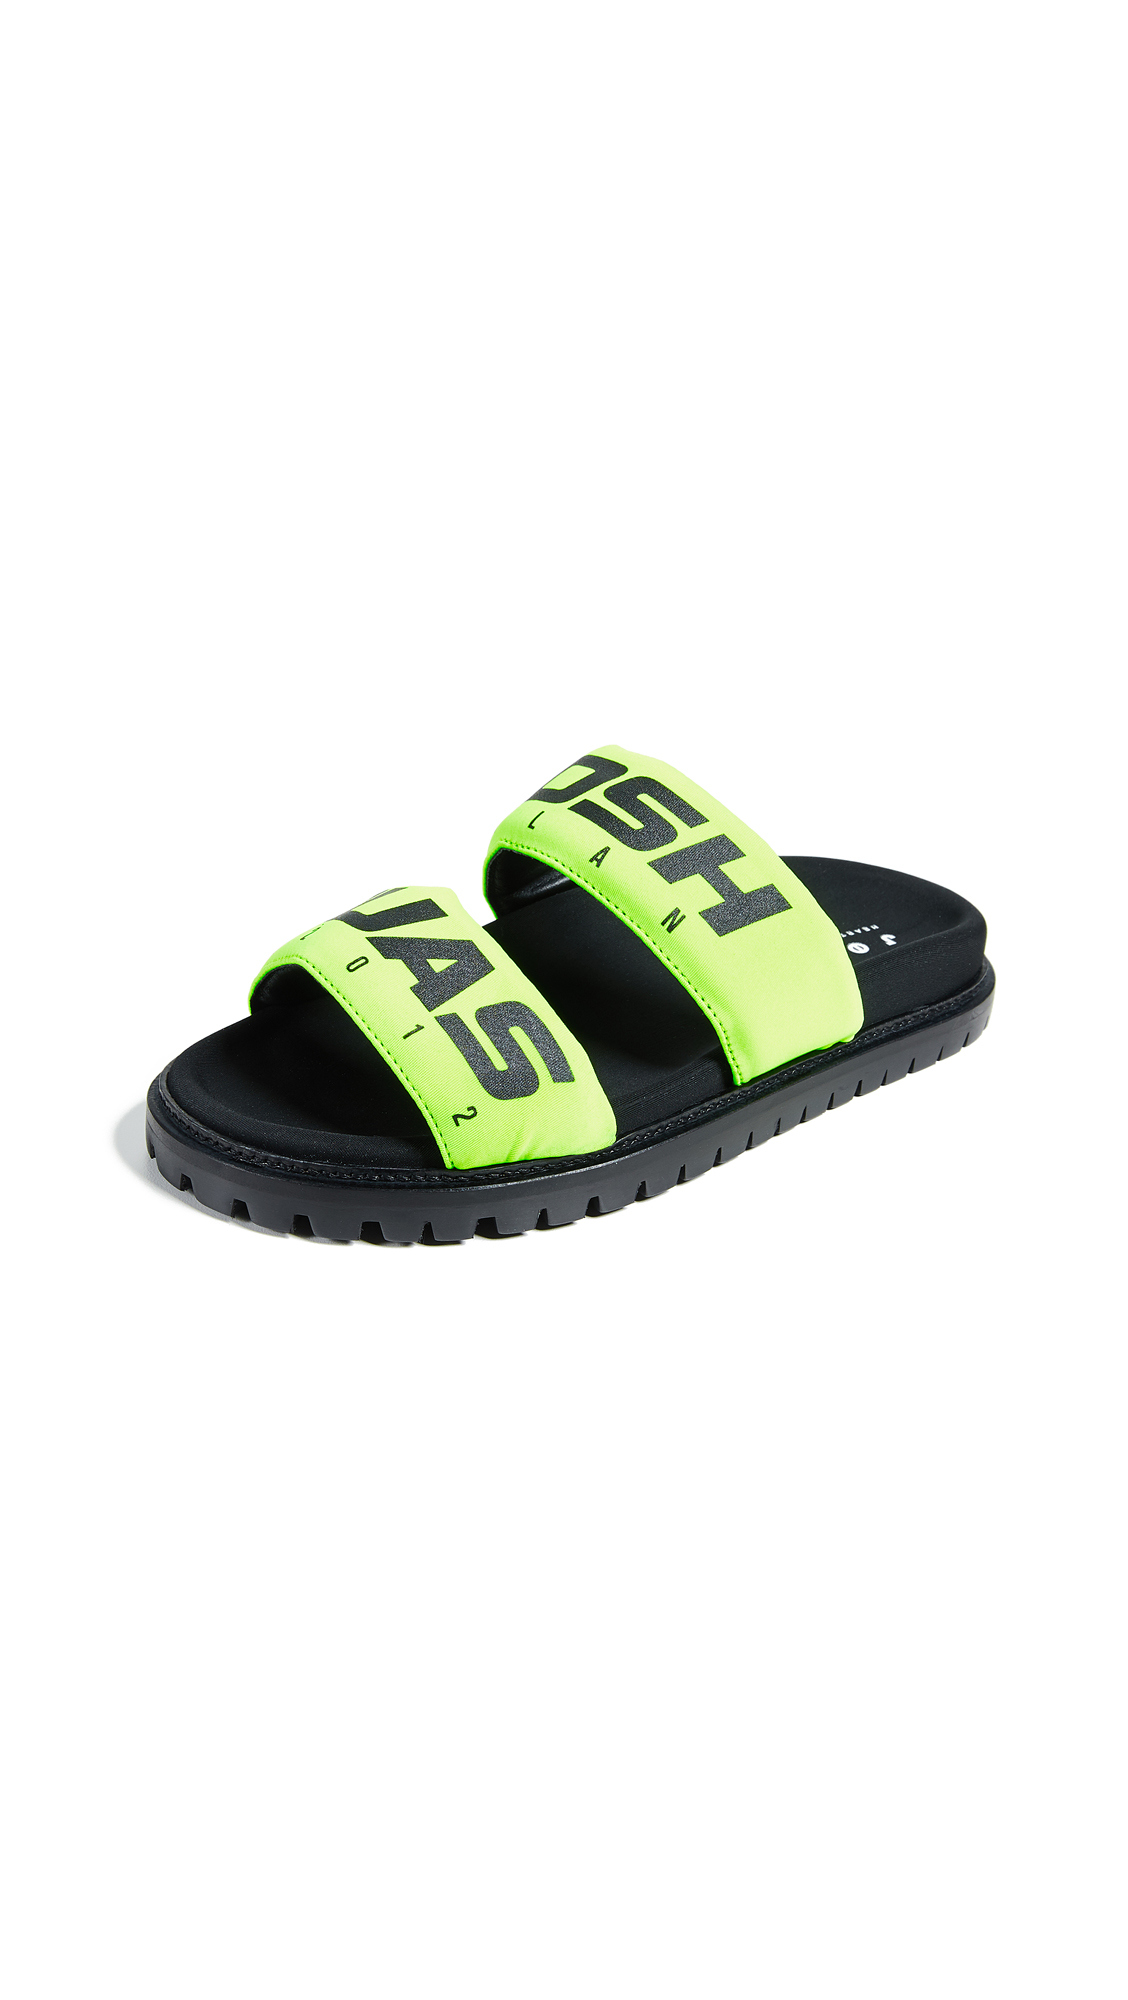 Joshua Sanders Racing Slide Sandals